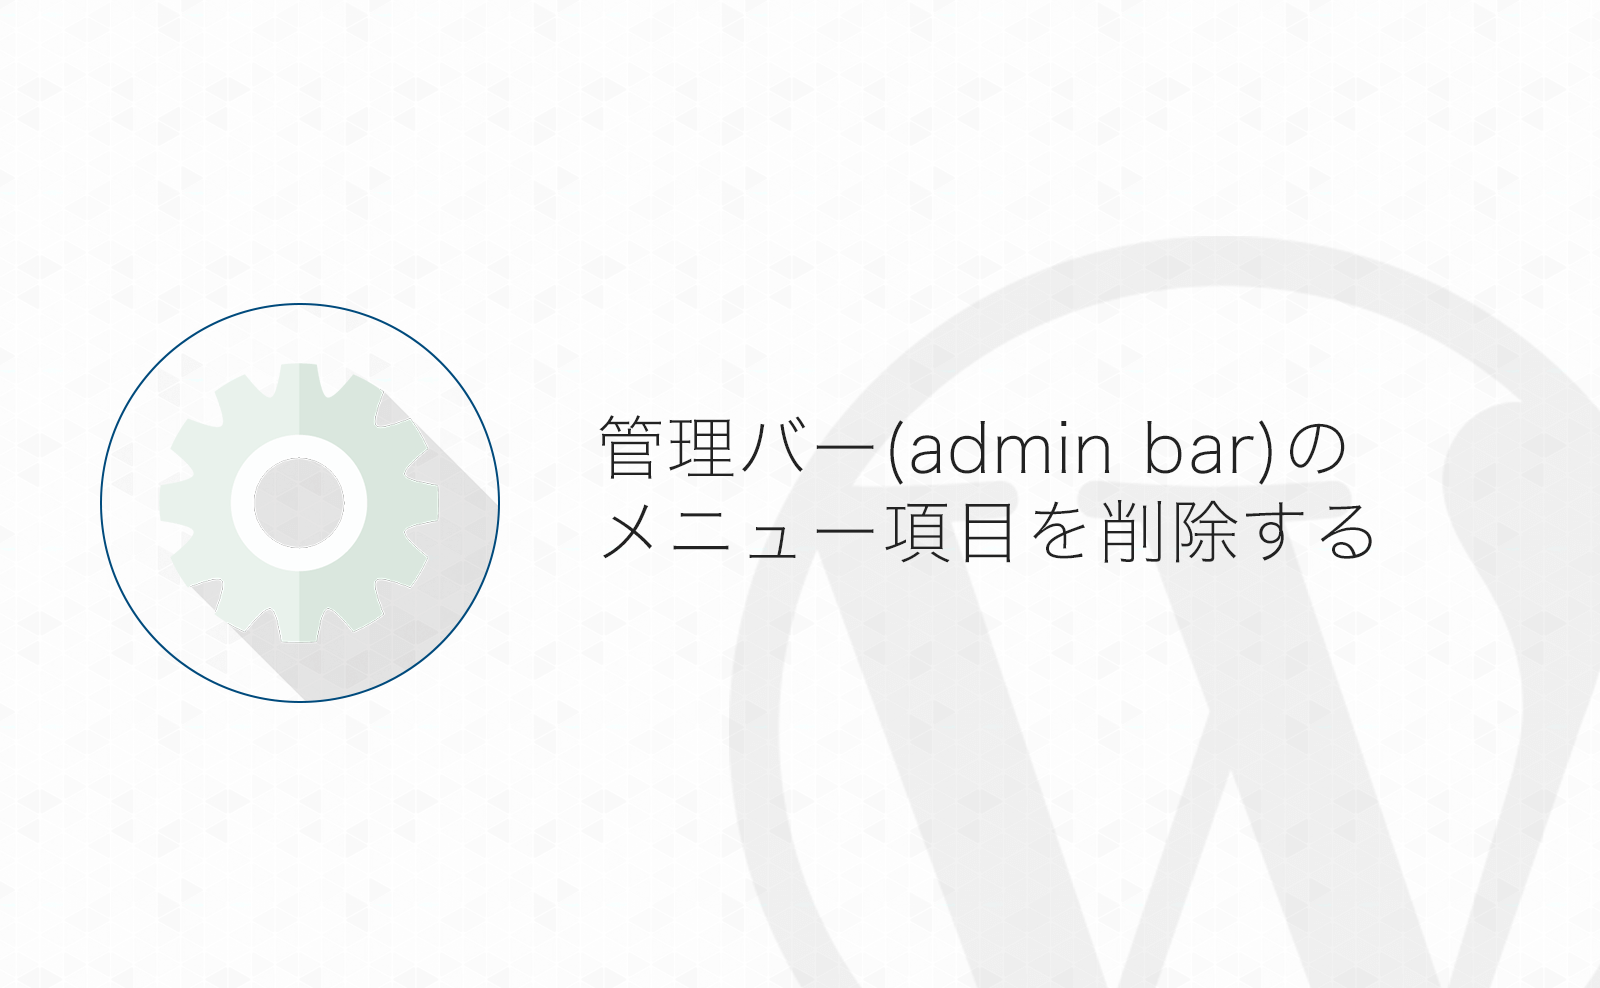 【WordPress】管理バー(admin bar)のメニュー項目を削除する方法